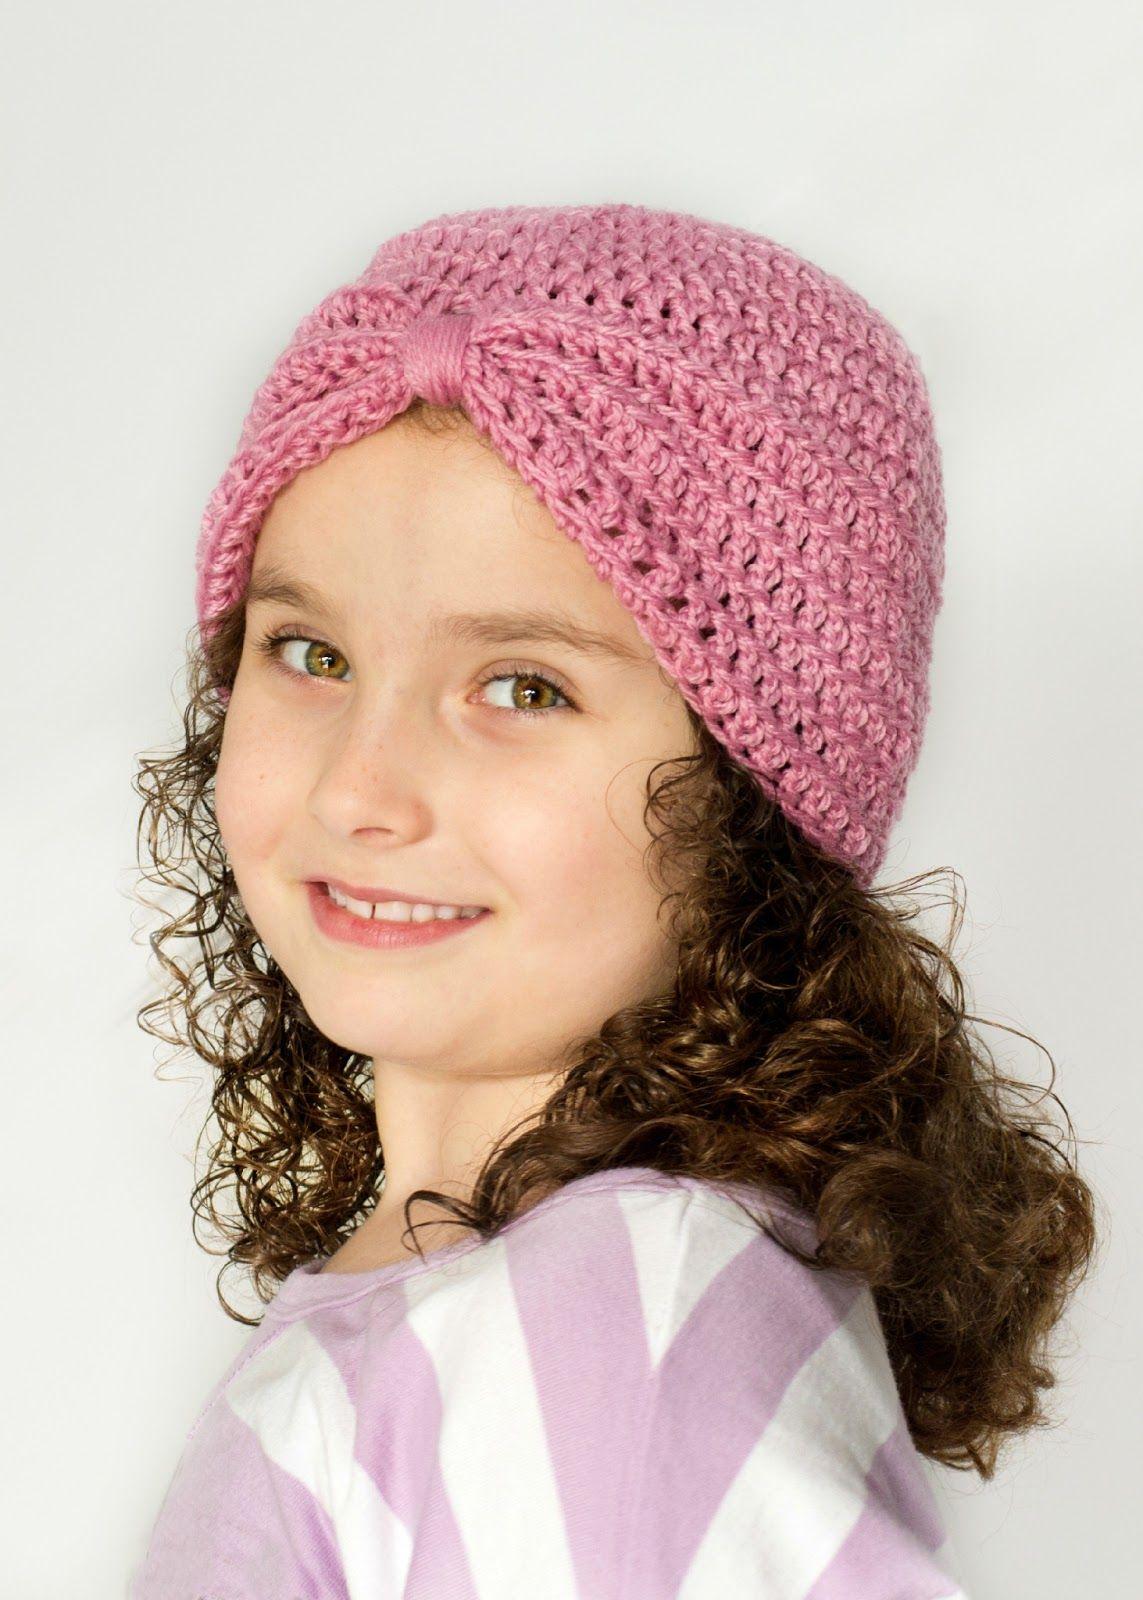 Basic Turban Crochet Pattern | Pinterest | Gehäkelte mützen, Mütze ...